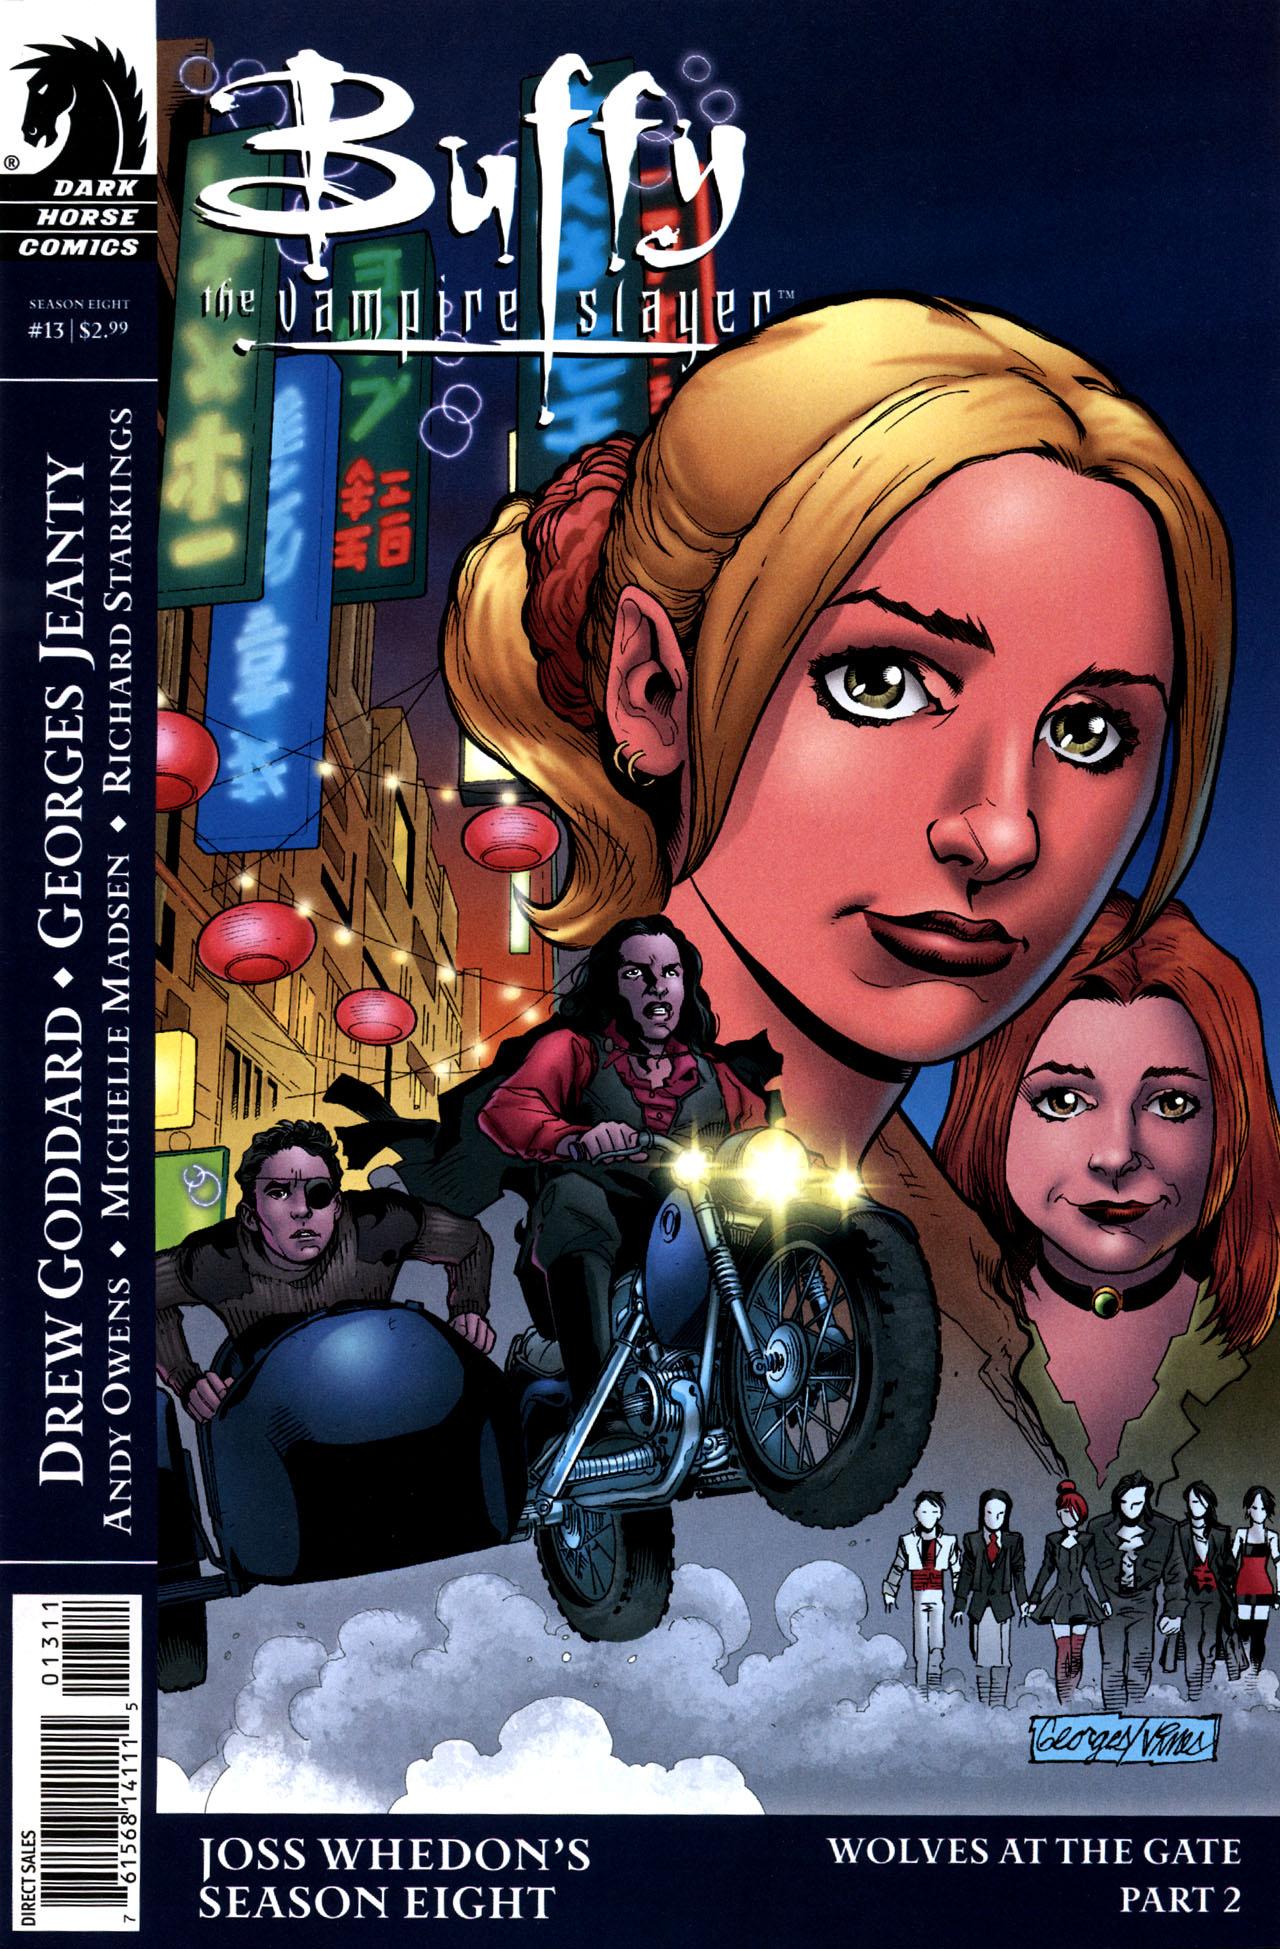 Buffy the Vampire Slayer Season Eight 13 Page 2